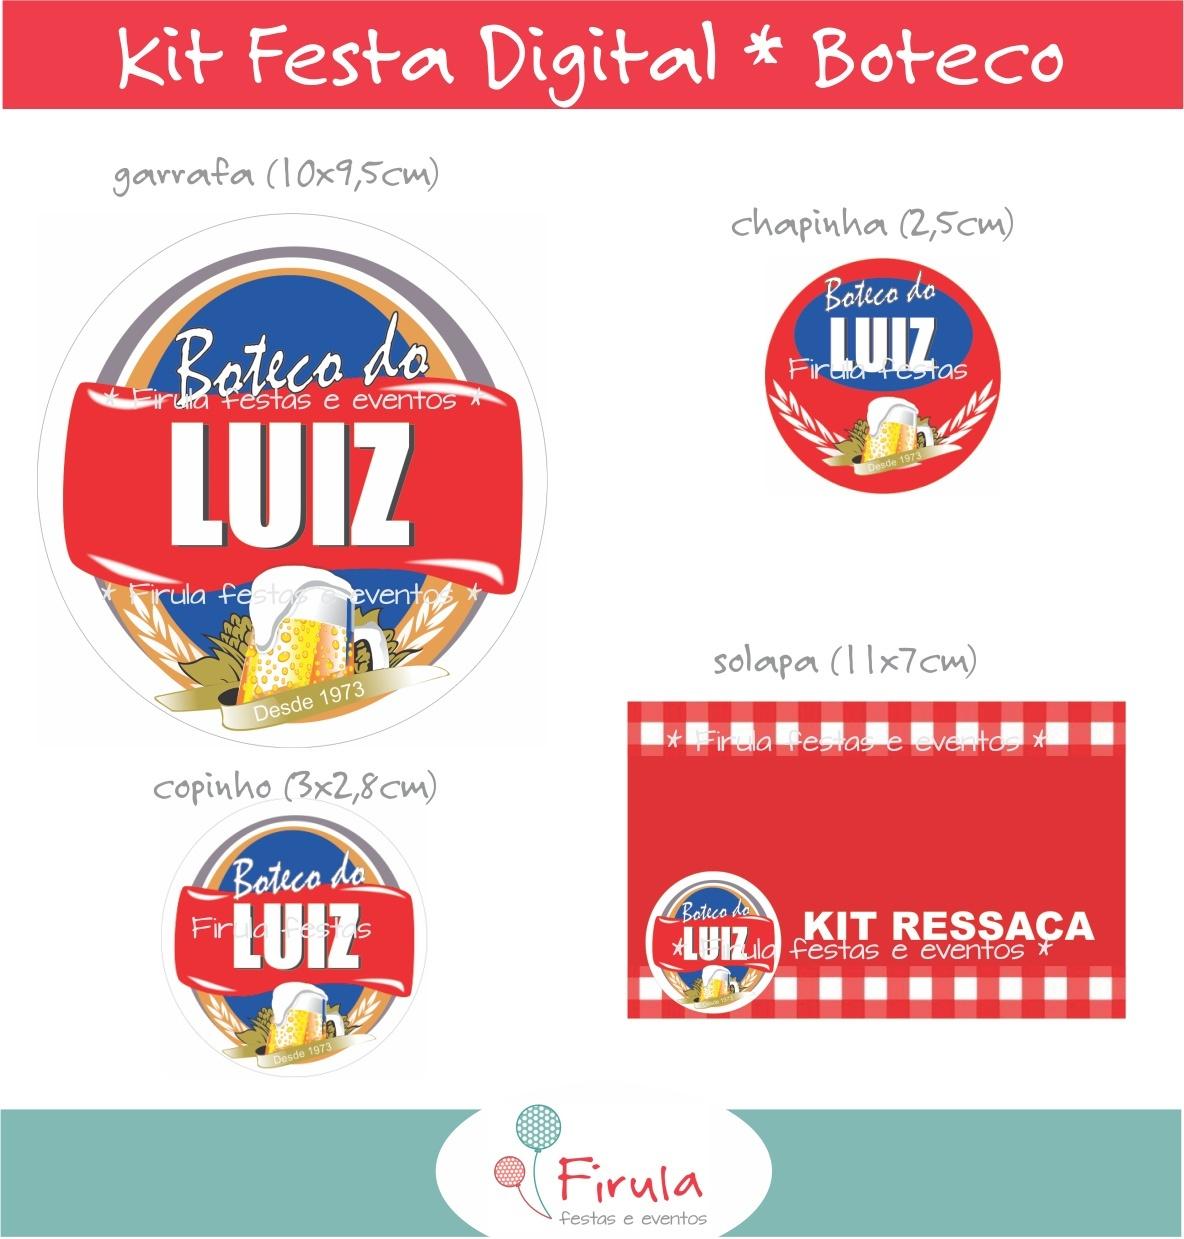 decoracao festa boteco passo a passo:Kit Festa Digital Boteco #B6151C 1184 1239